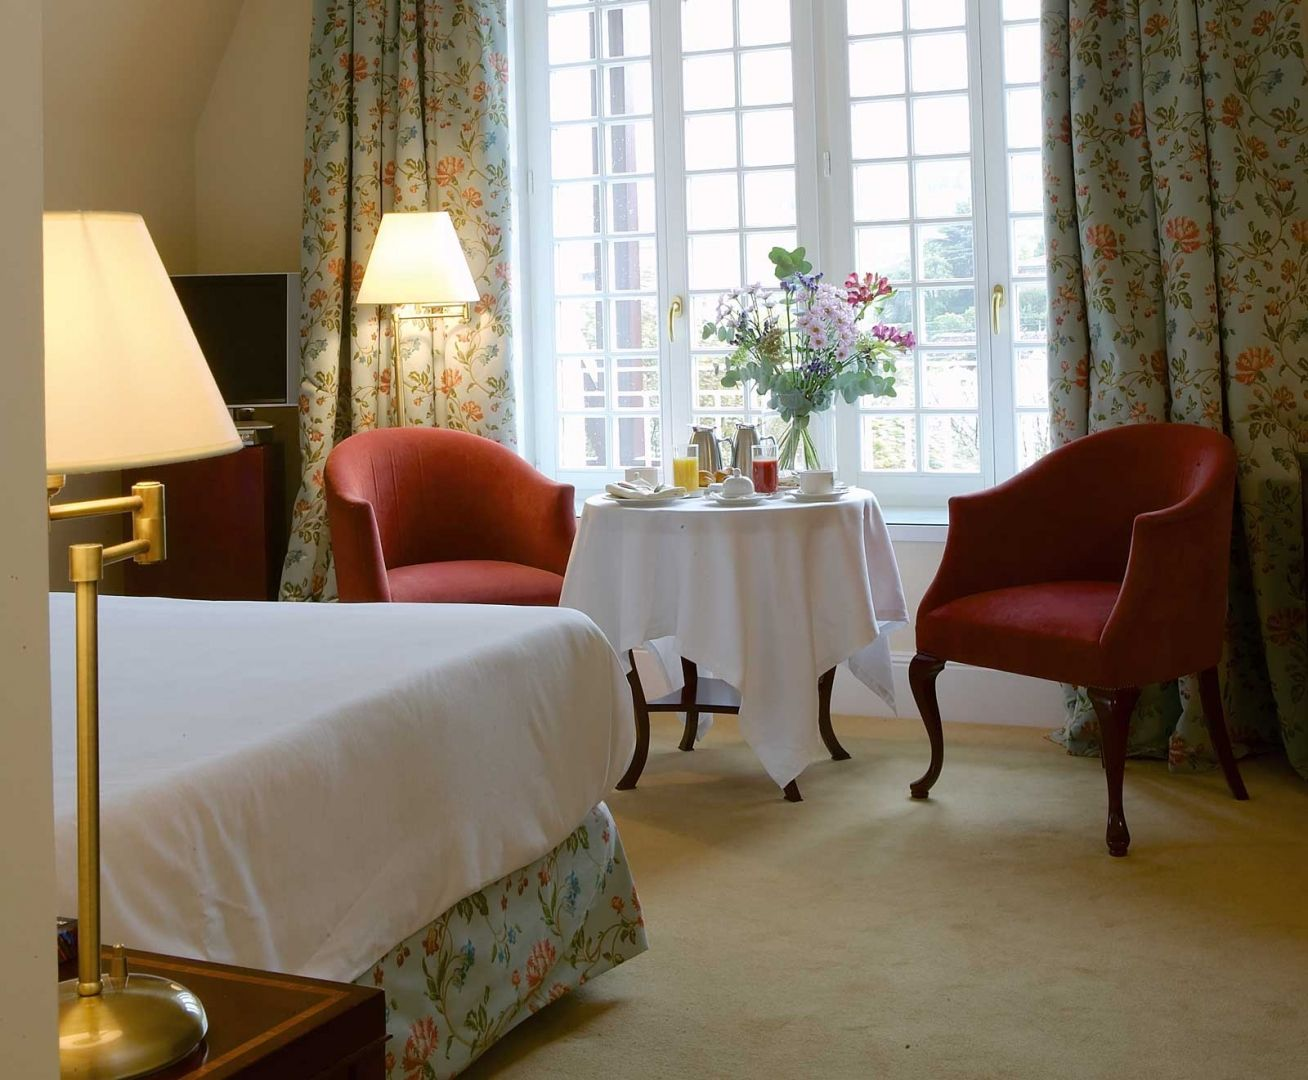 Villa Deluxe Room at the Villa Soro Hotel in San Sebastian